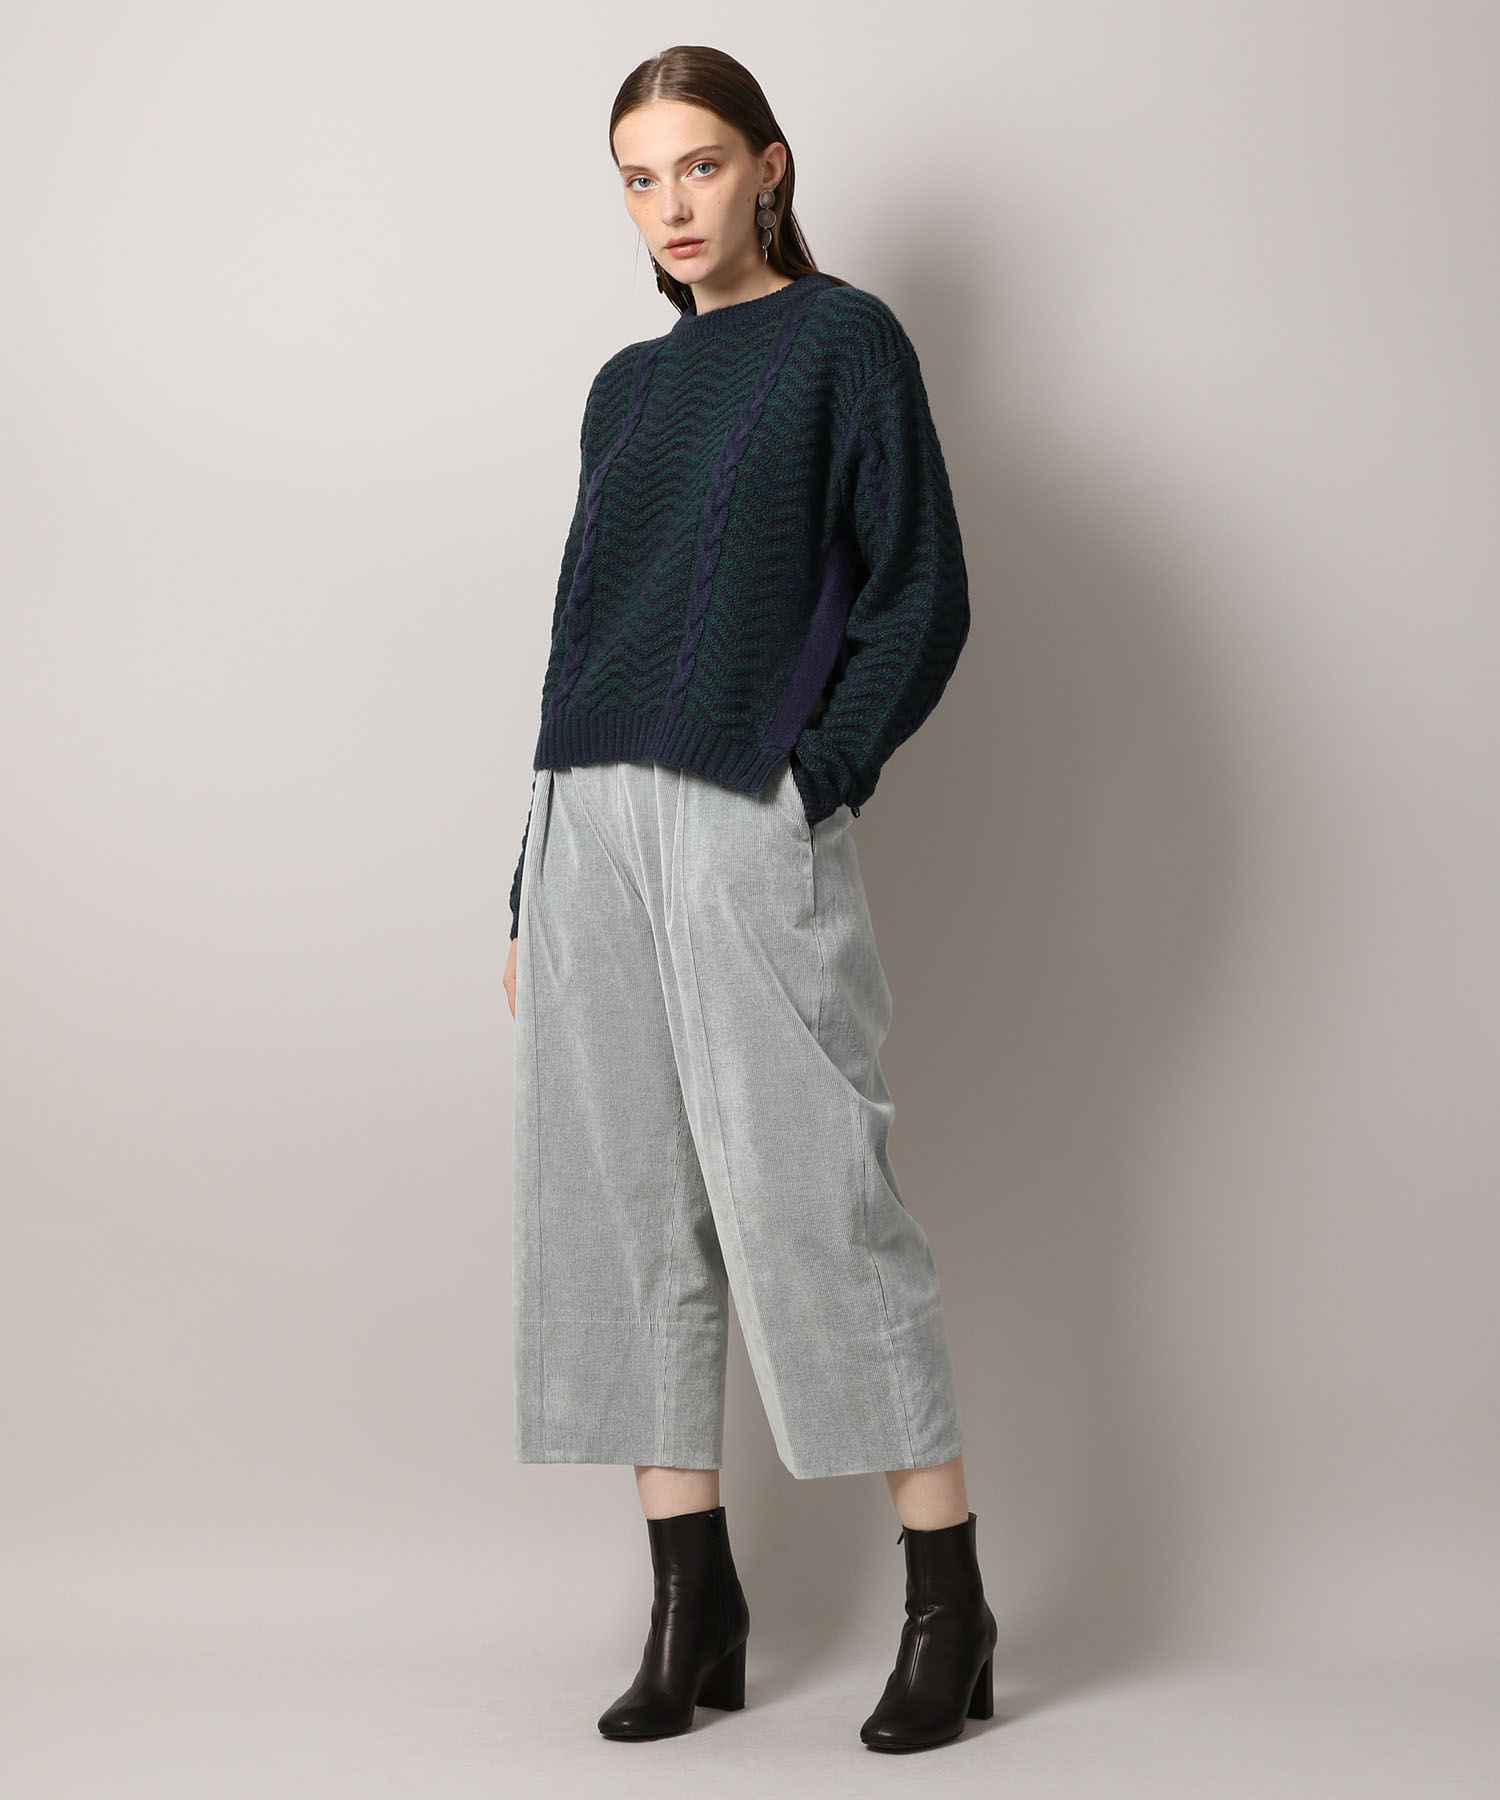 【先行予約10%OFF・送料無料】Cropped Corduroy Pants